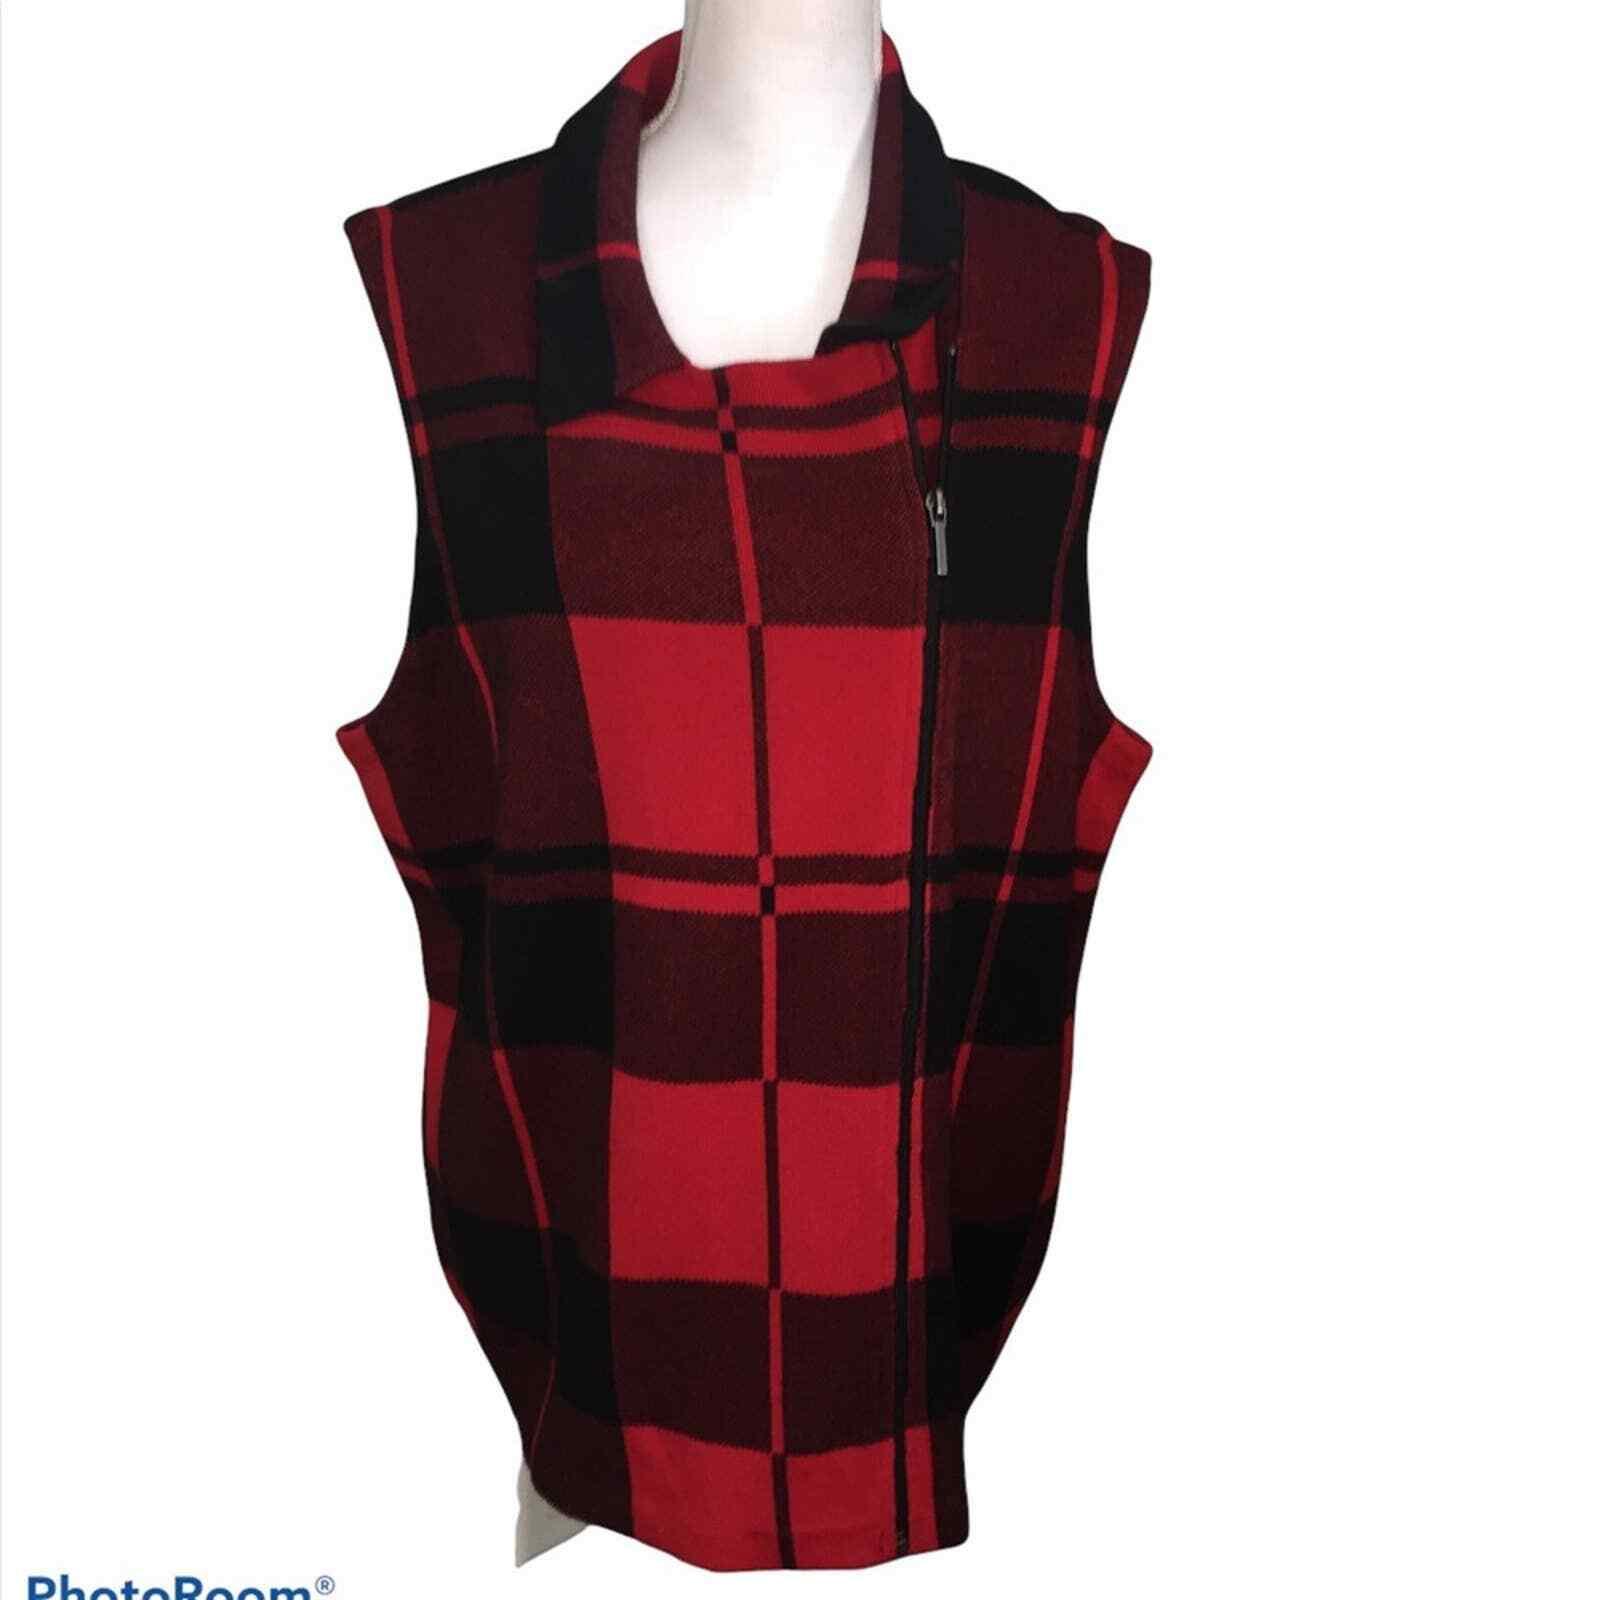 Chaps Buffalo Plaid Vest Knit Red Black Sz 2XL